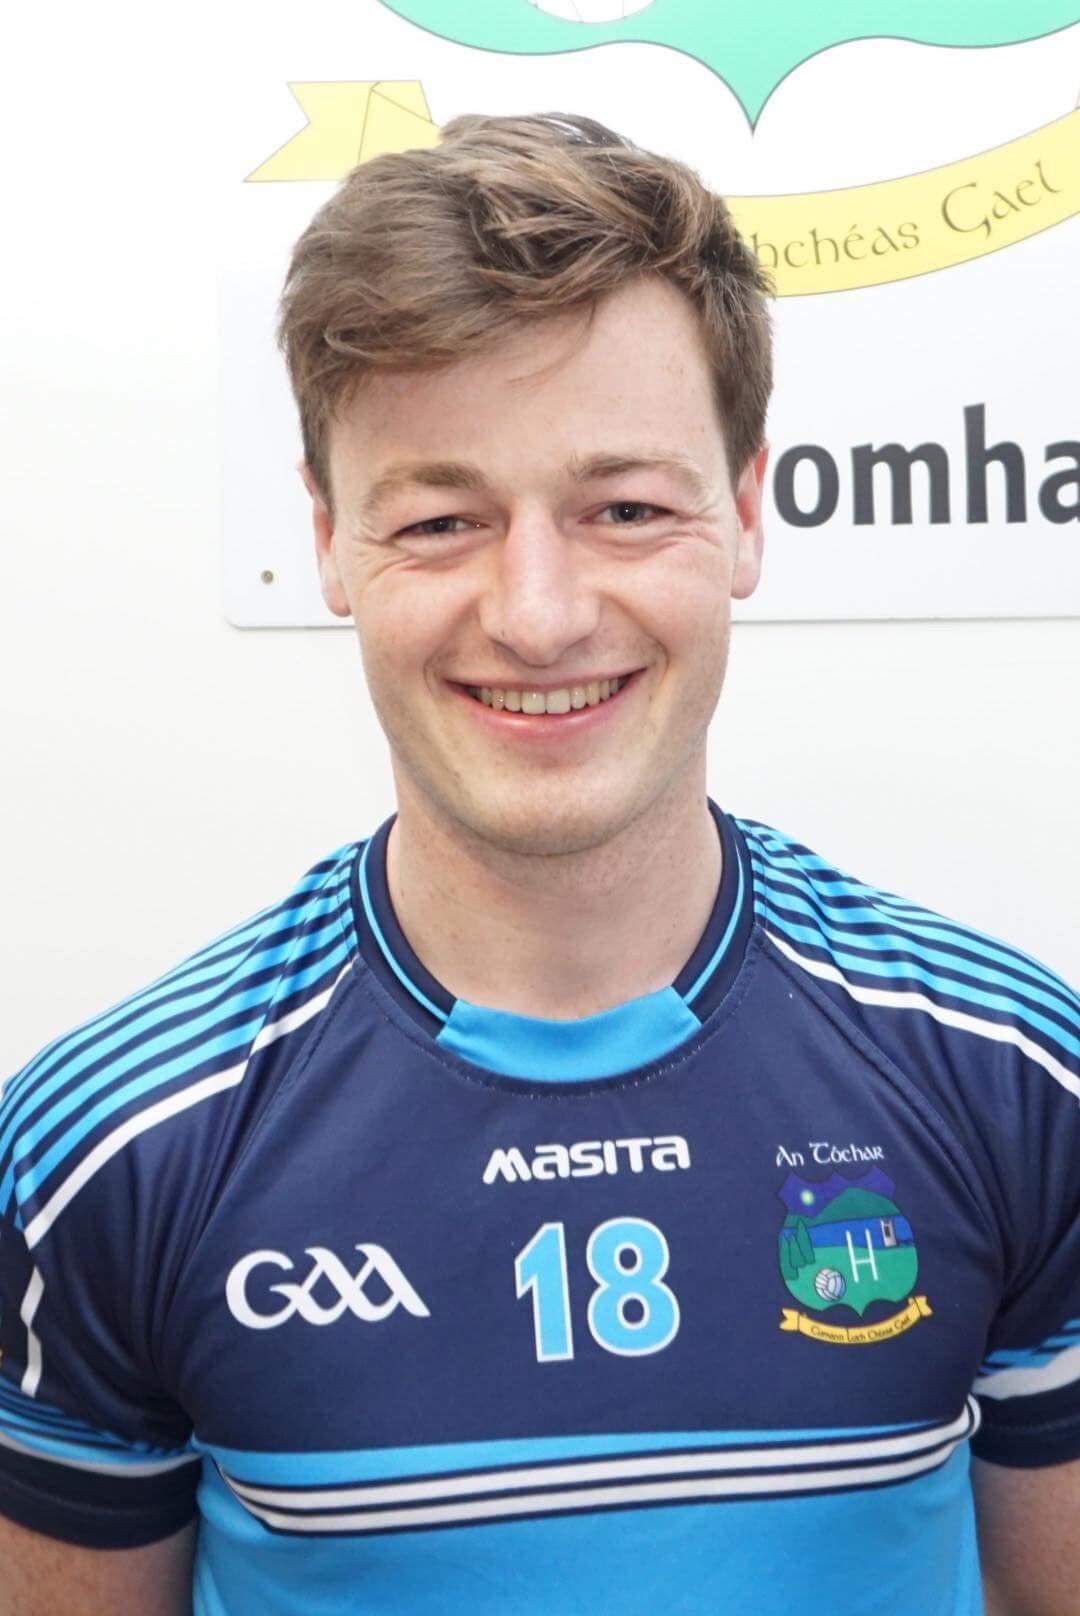 Eoghan Maragh